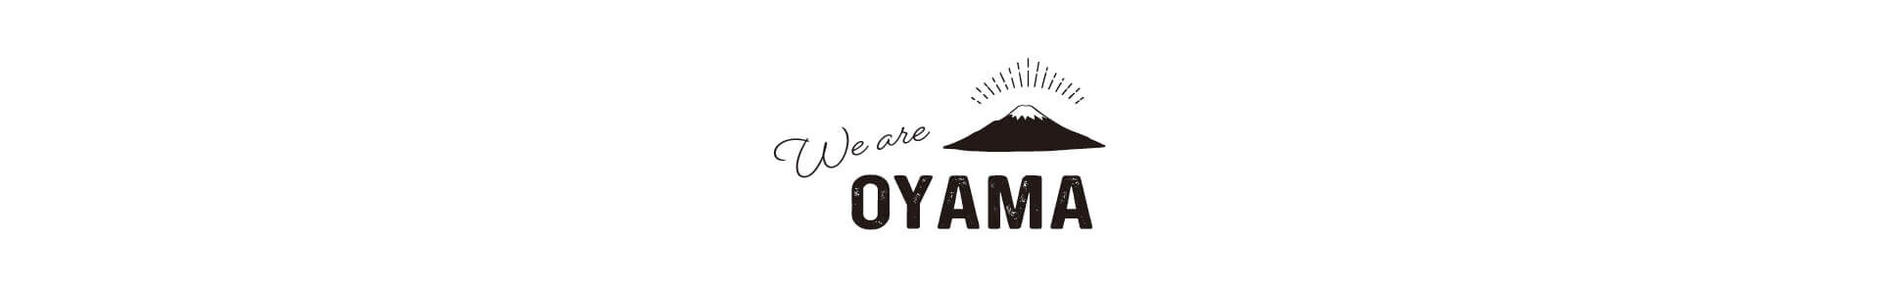 We are OYAMA